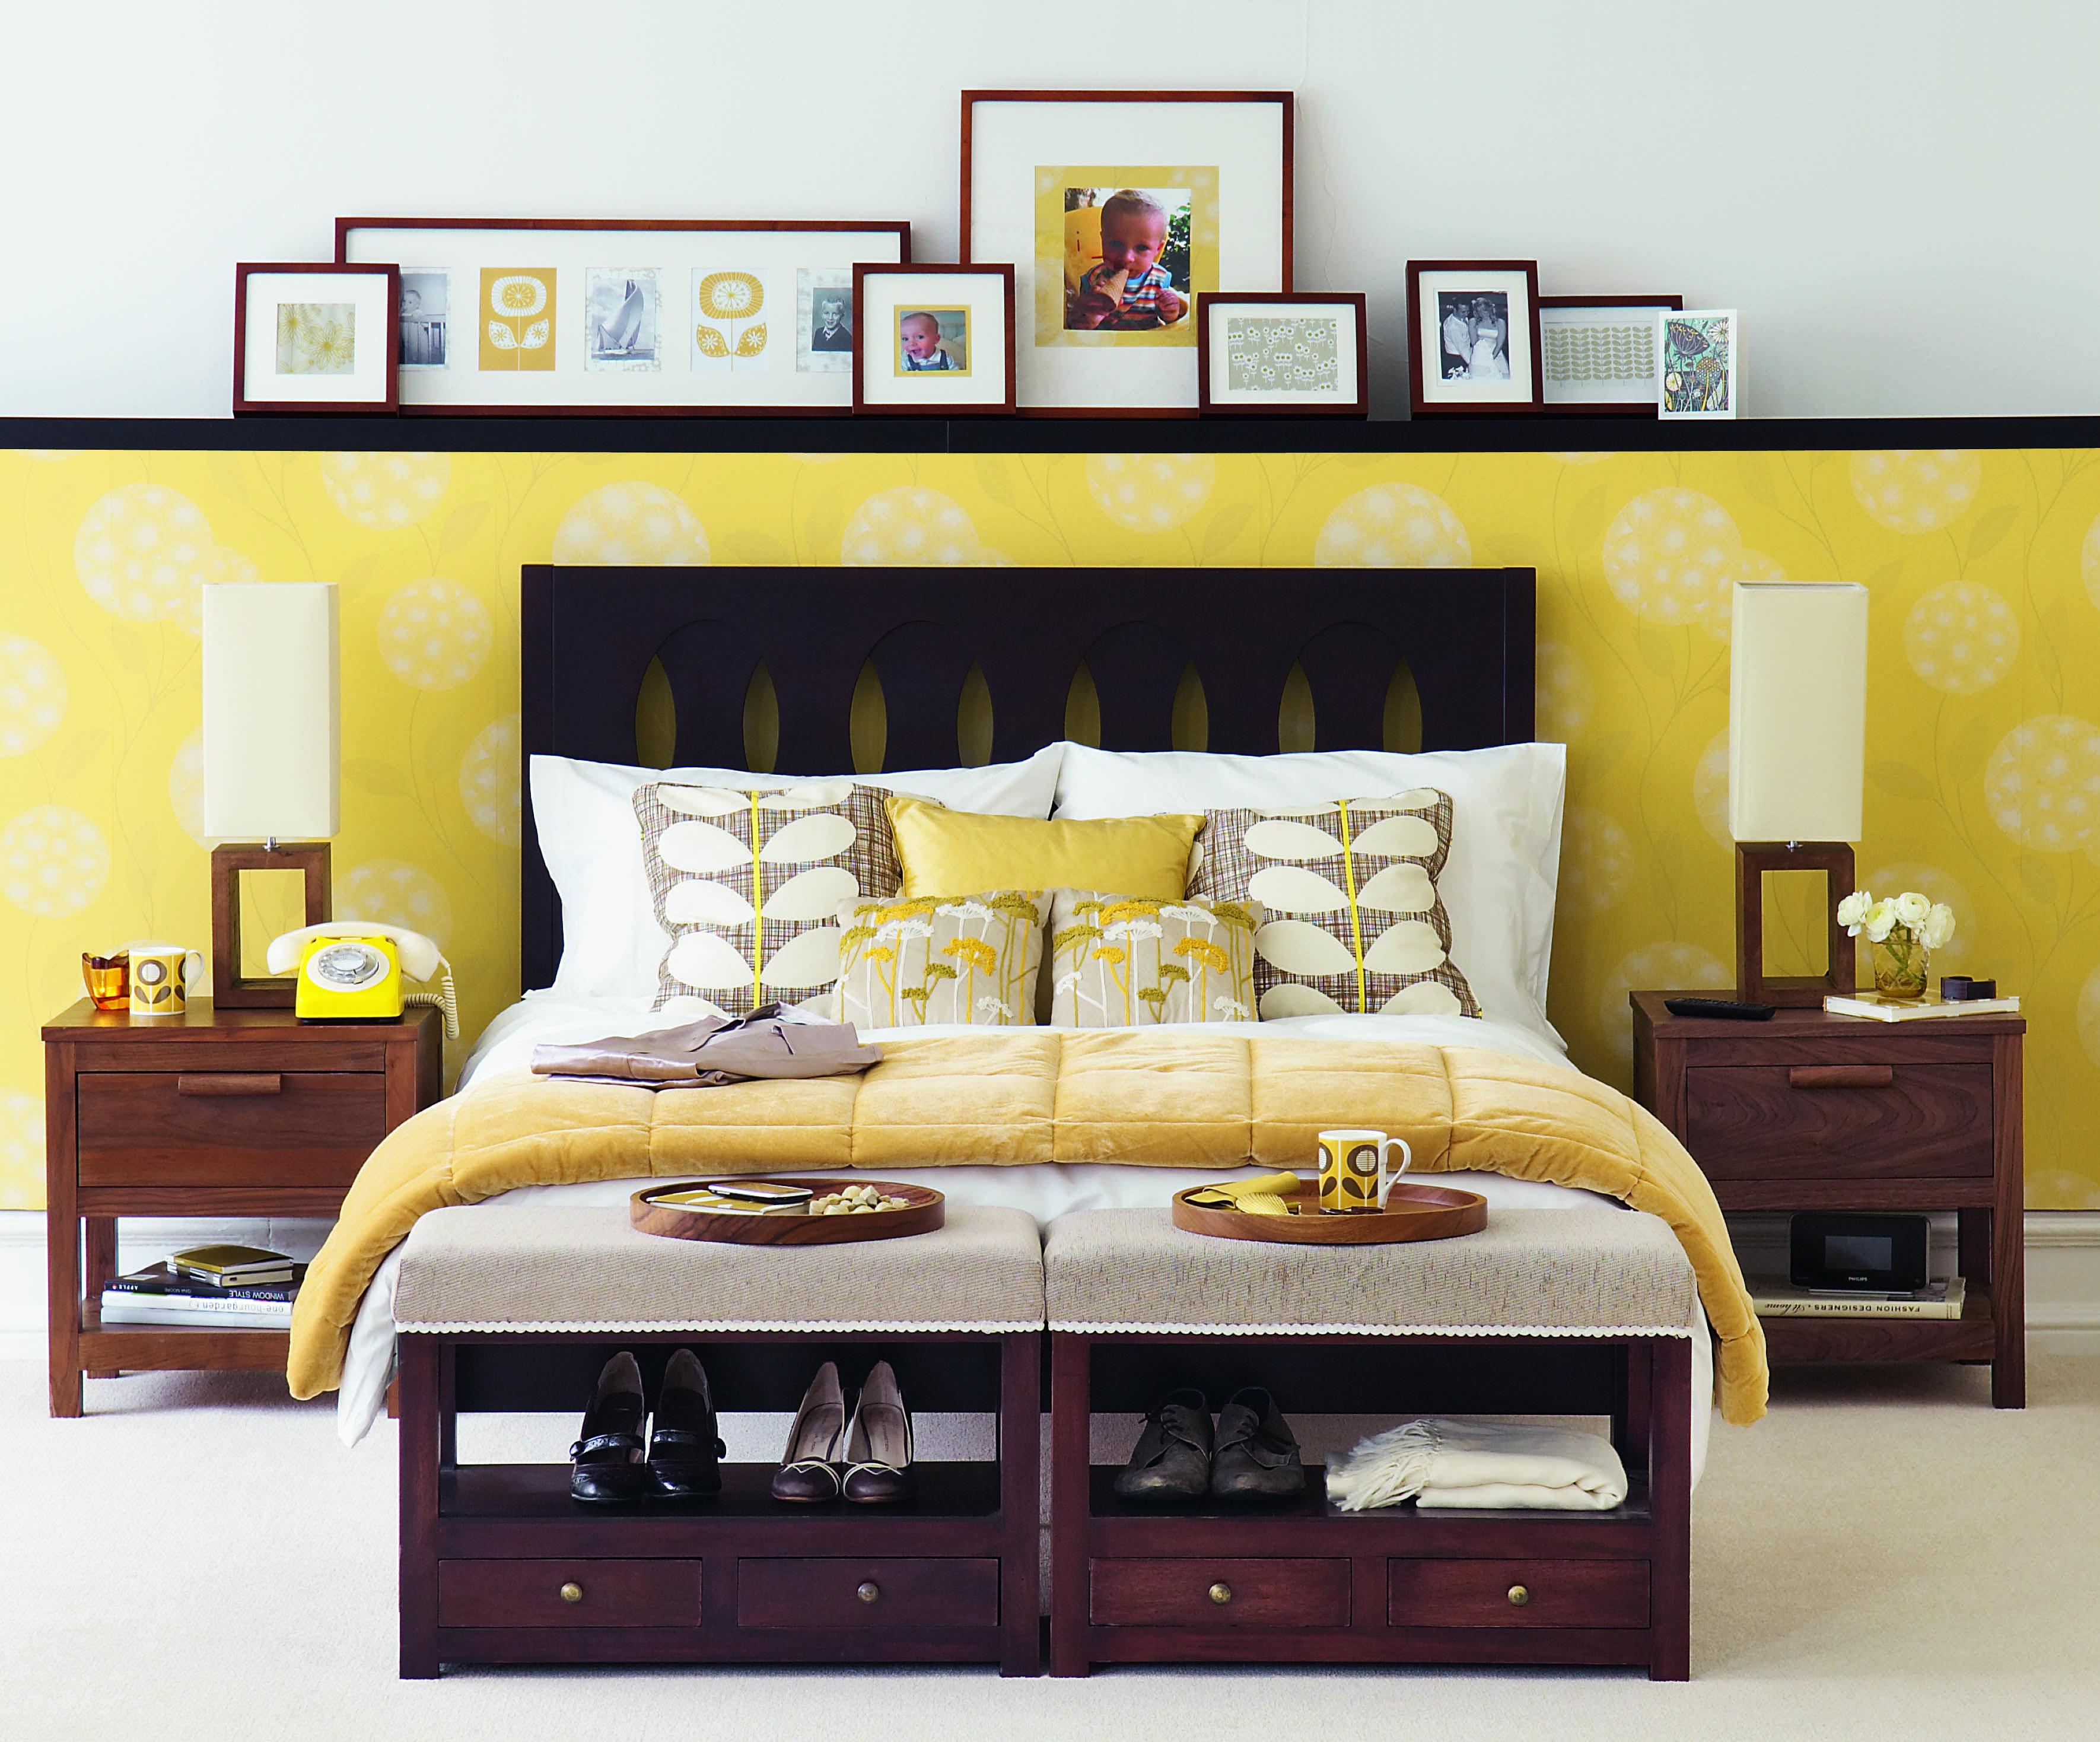 Like the idea of shelf to cut down wallpaper cost. | ideas 4 nu ...